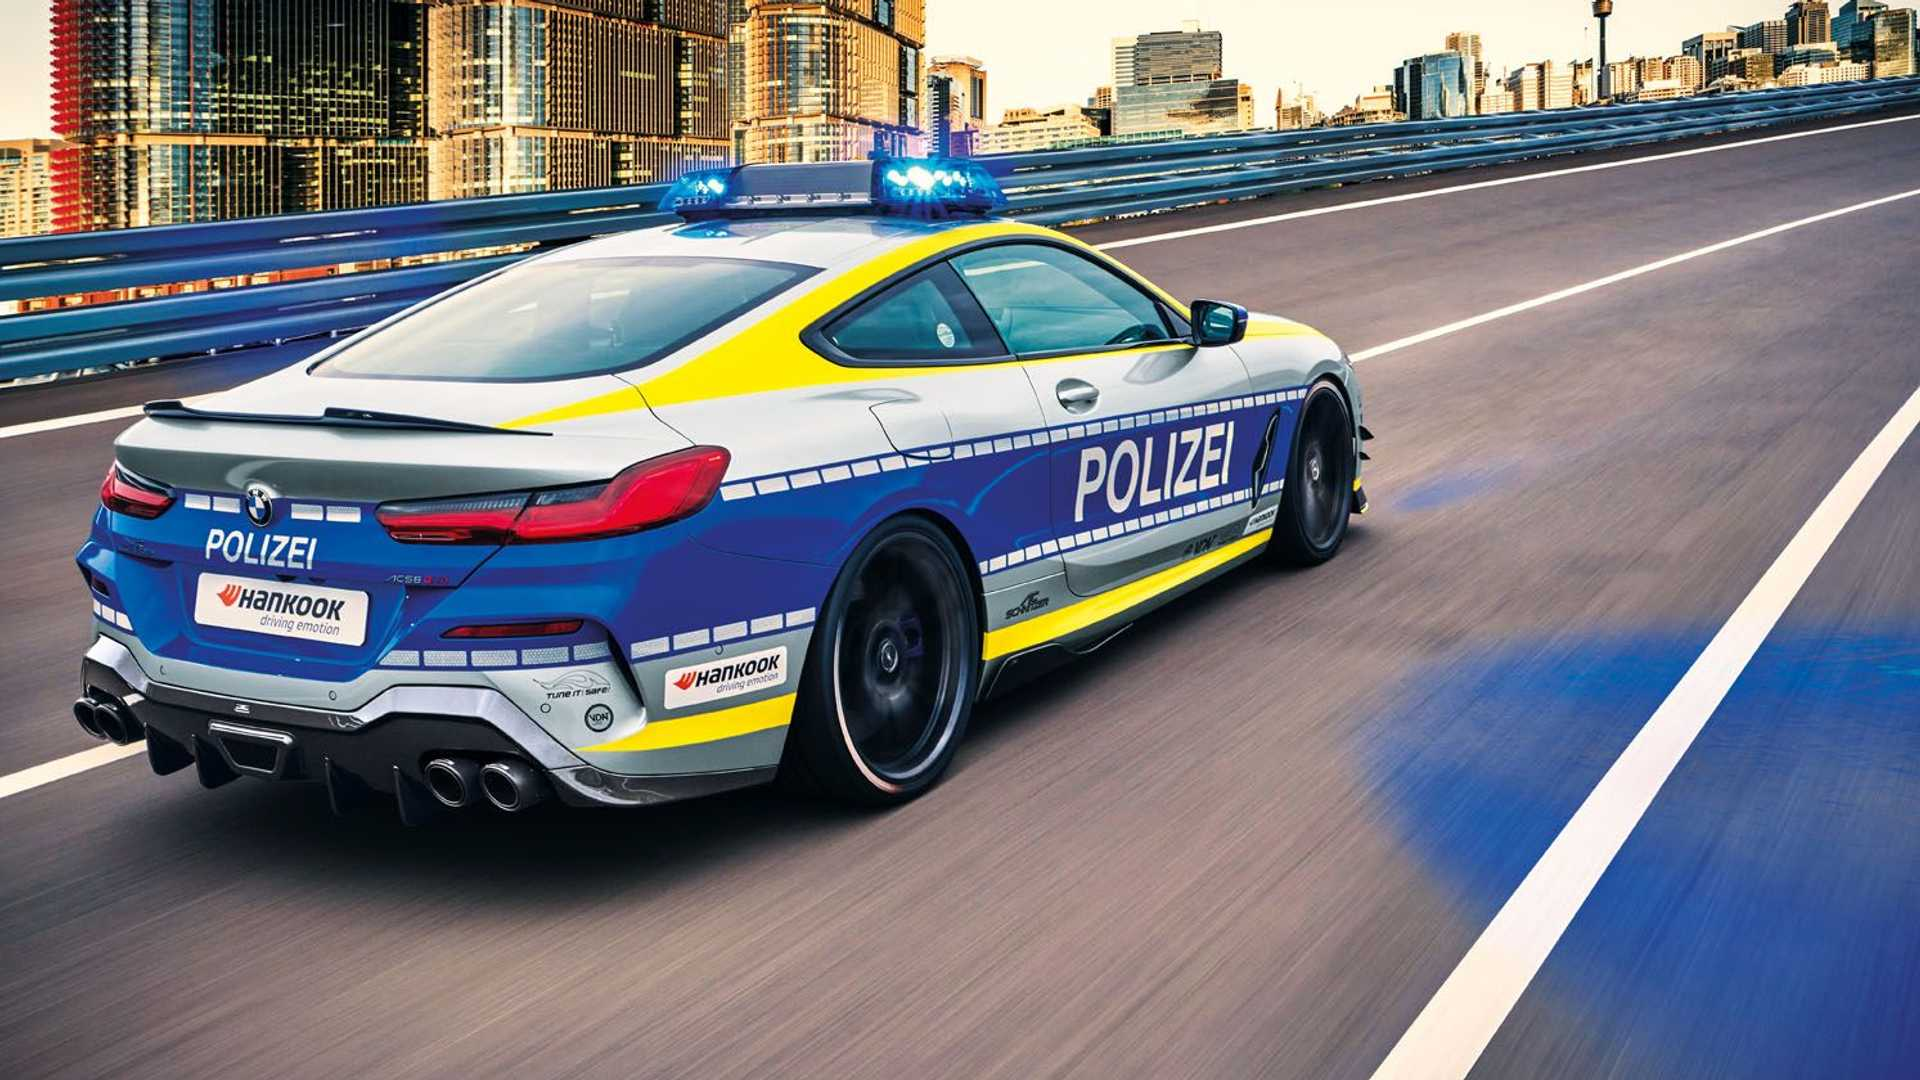 BMW-M850i-police-car-tune-it-safe-29